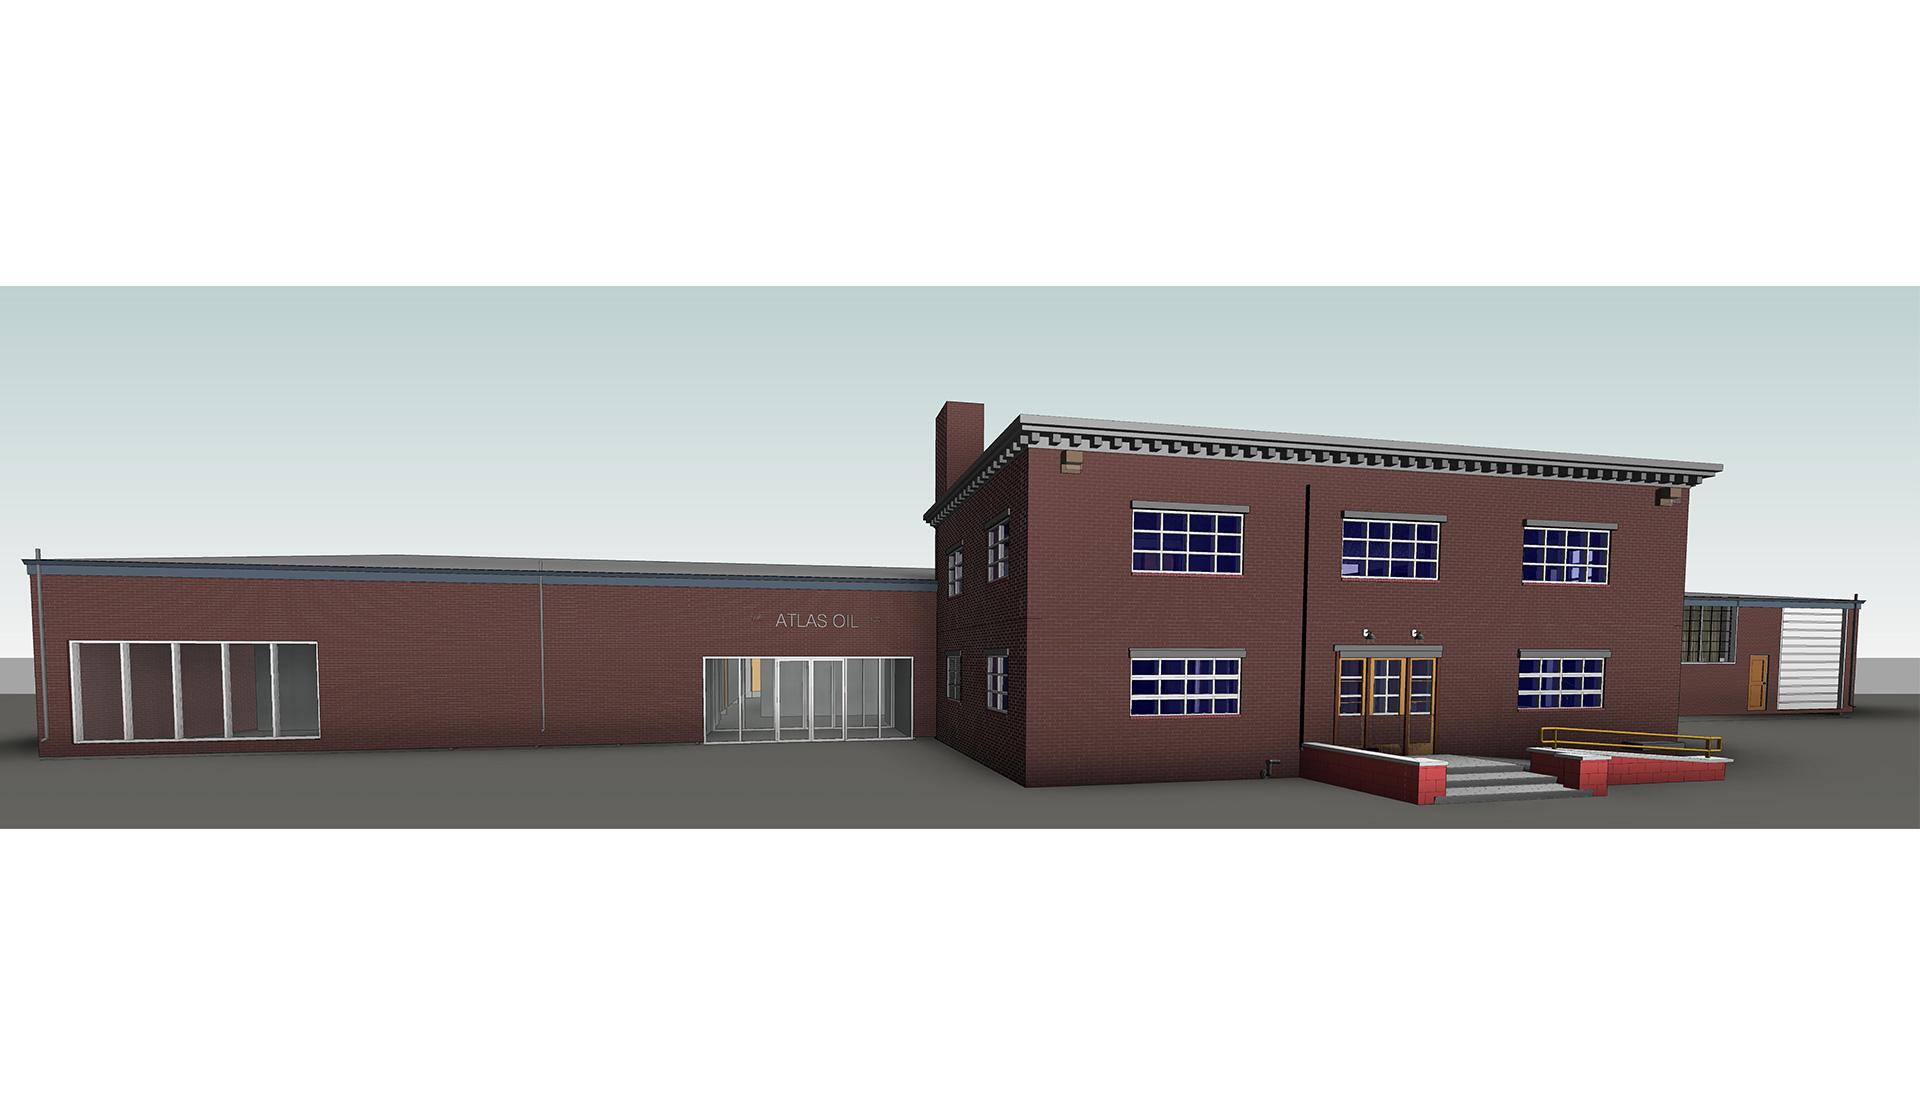 3D-Architectural-Commercial-BIM-Model-Revit-Modeling-by-United-BIM